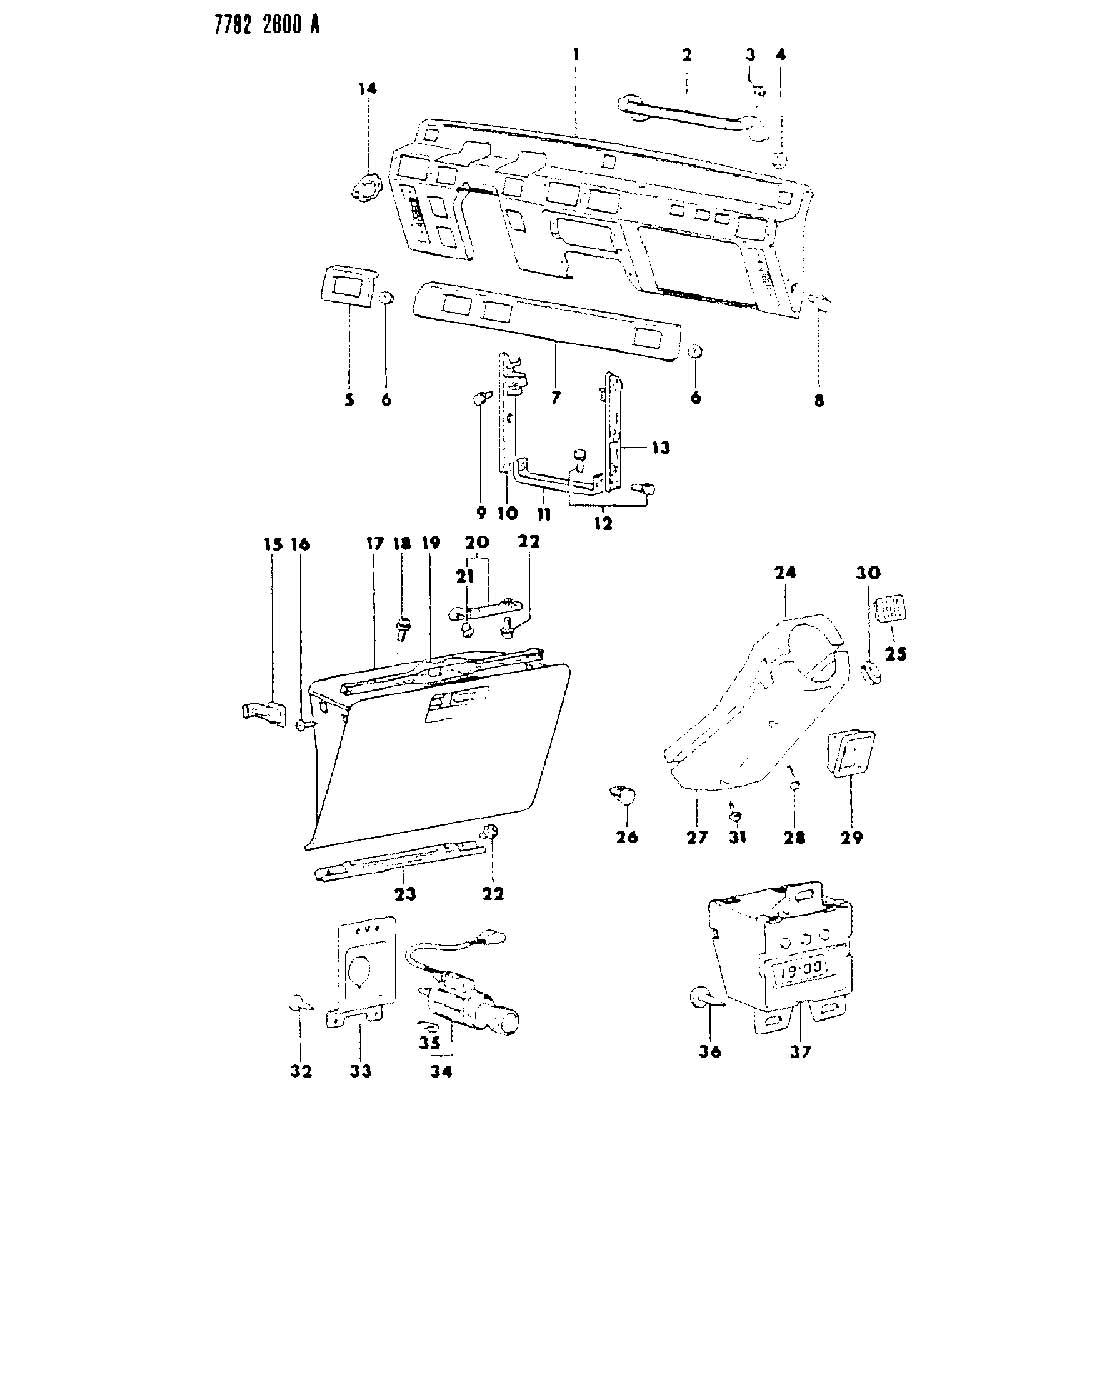 2000 Honda Civic Fuse Box Diagram Memes